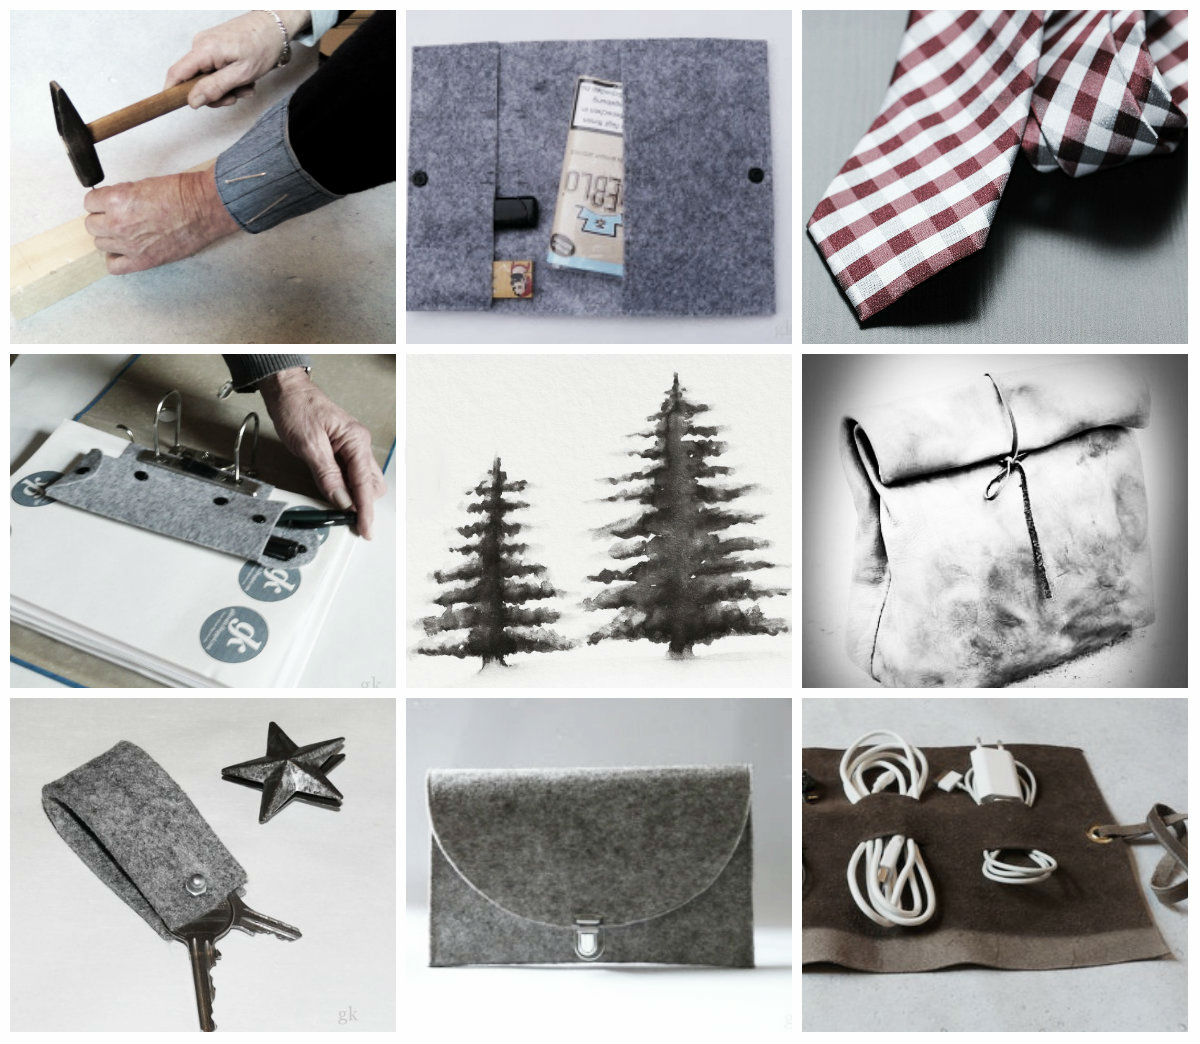 gk kreativ geschenke f r herren selber machen. Black Bedroom Furniture Sets. Home Design Ideas